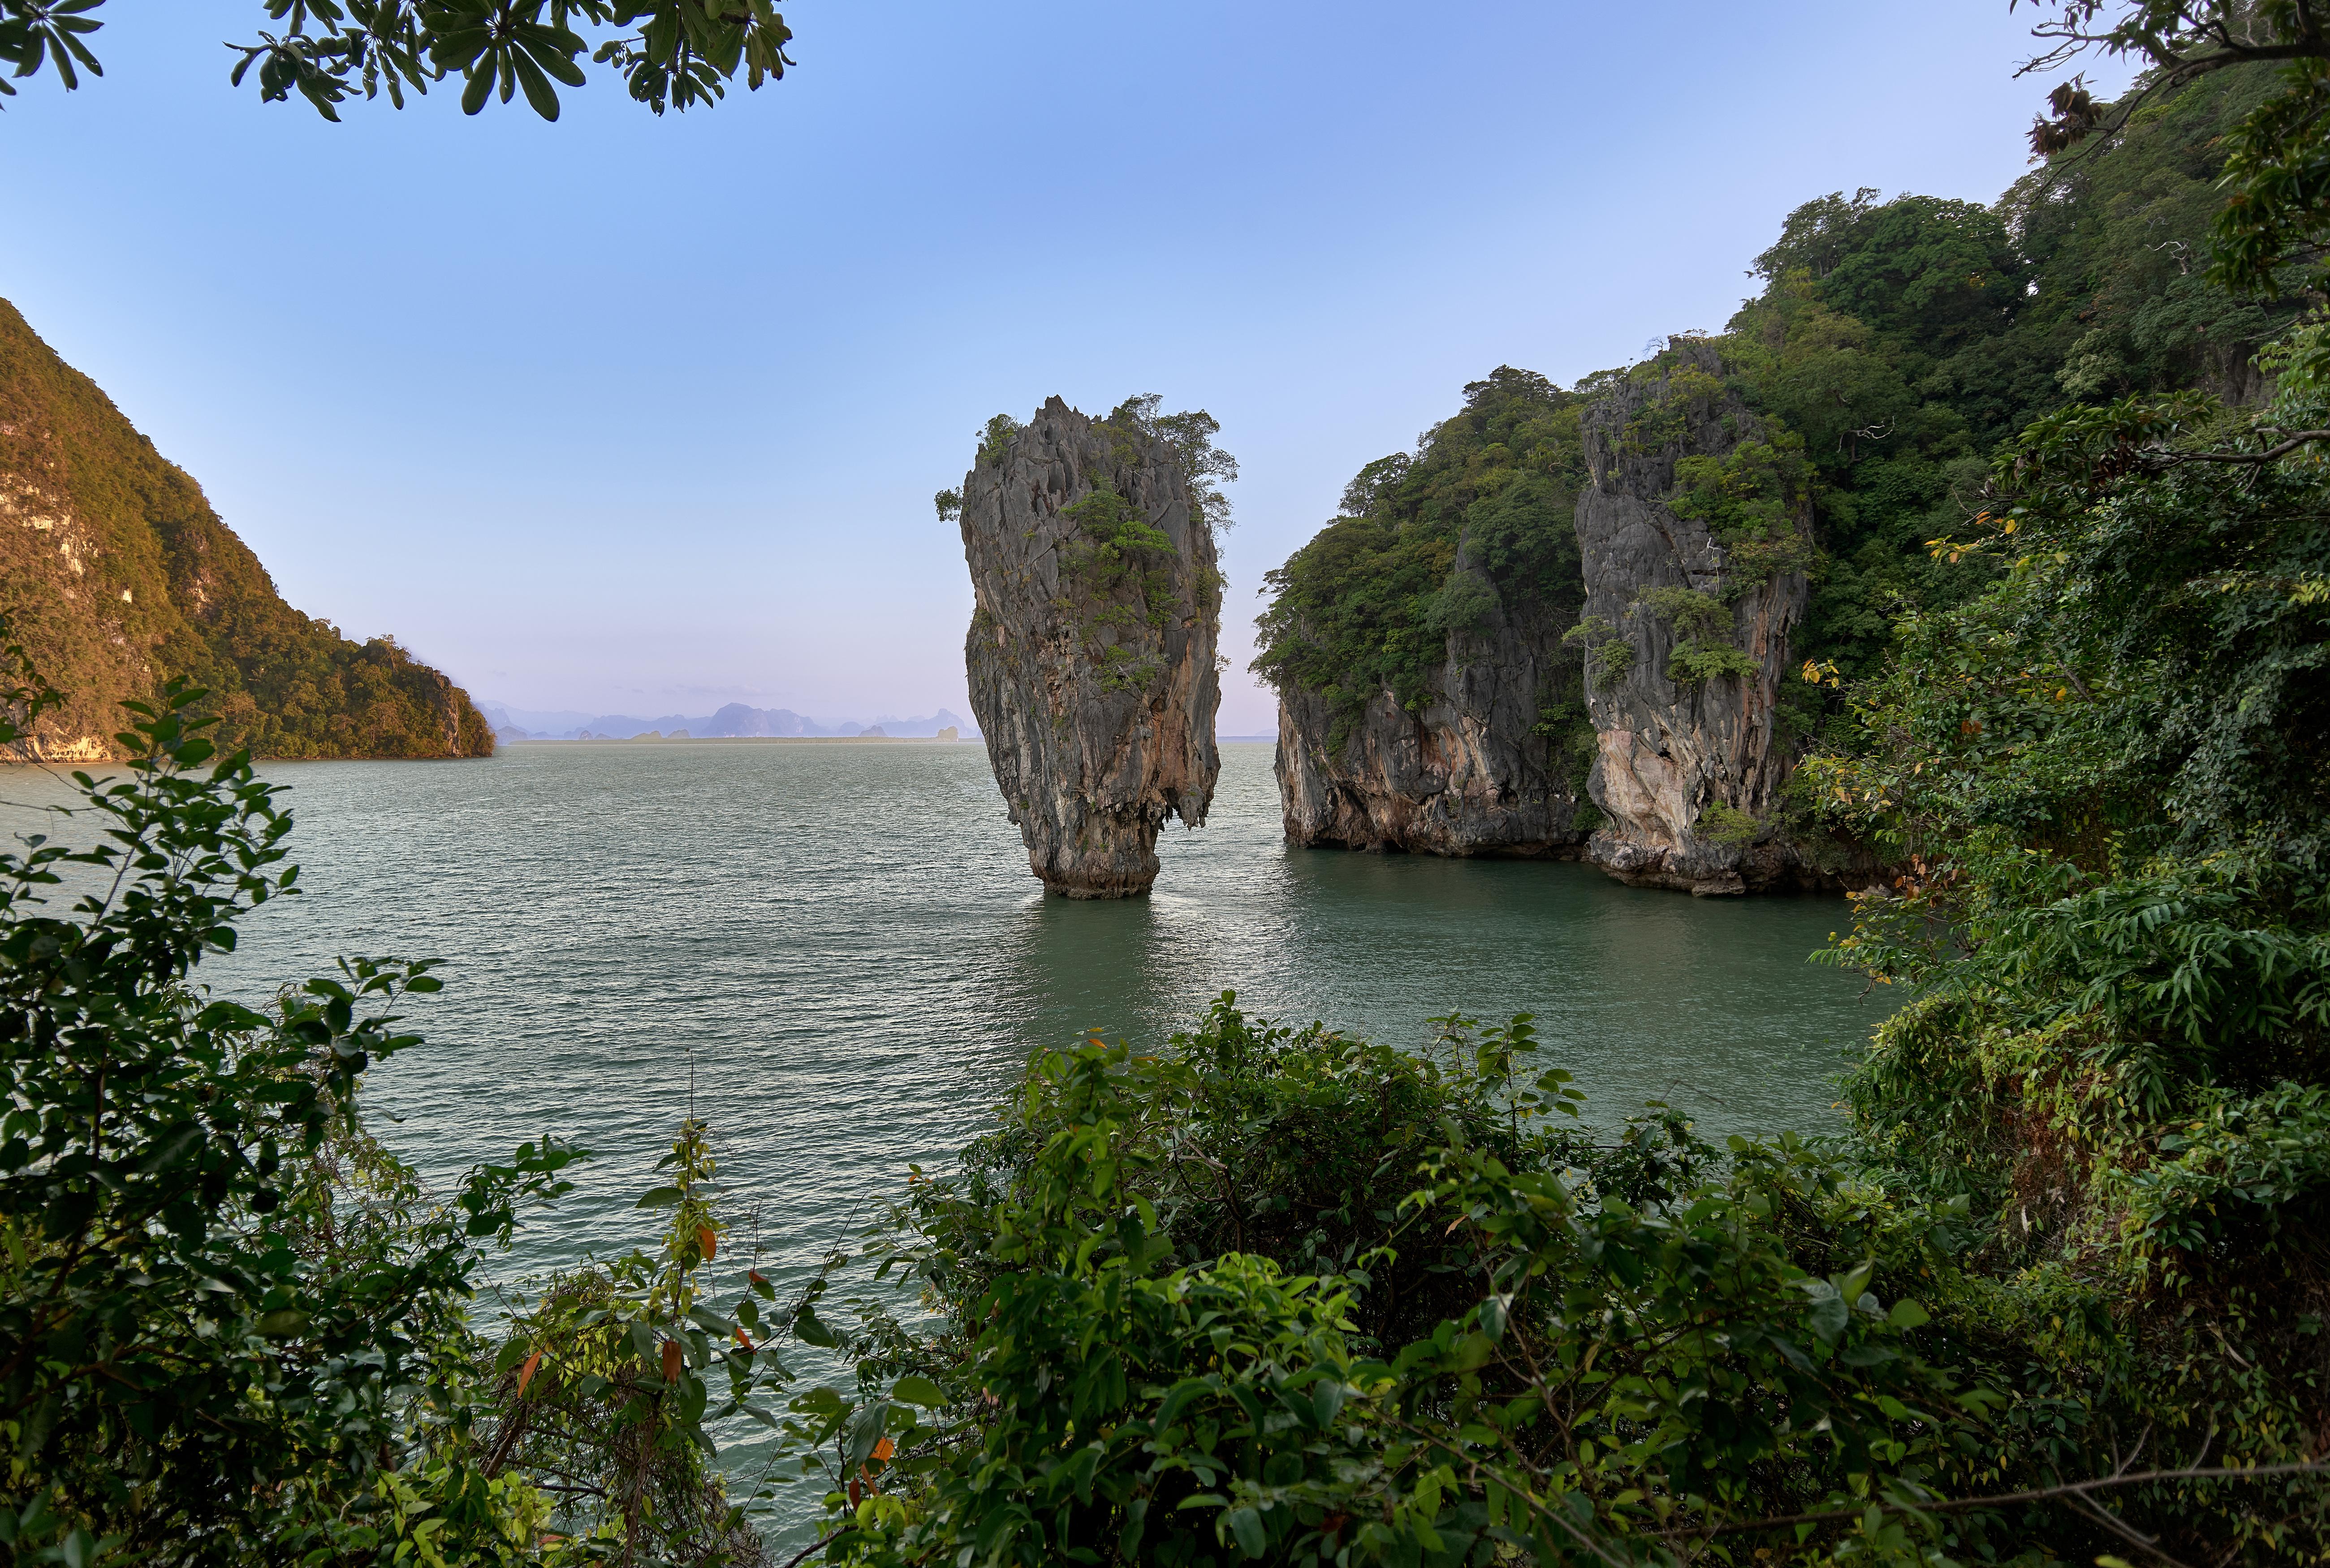 Фотография Таиланд Khao Phing Kan скале Природа Парки Залив 5200x3500 Утес Скала скалы парк залива заливы